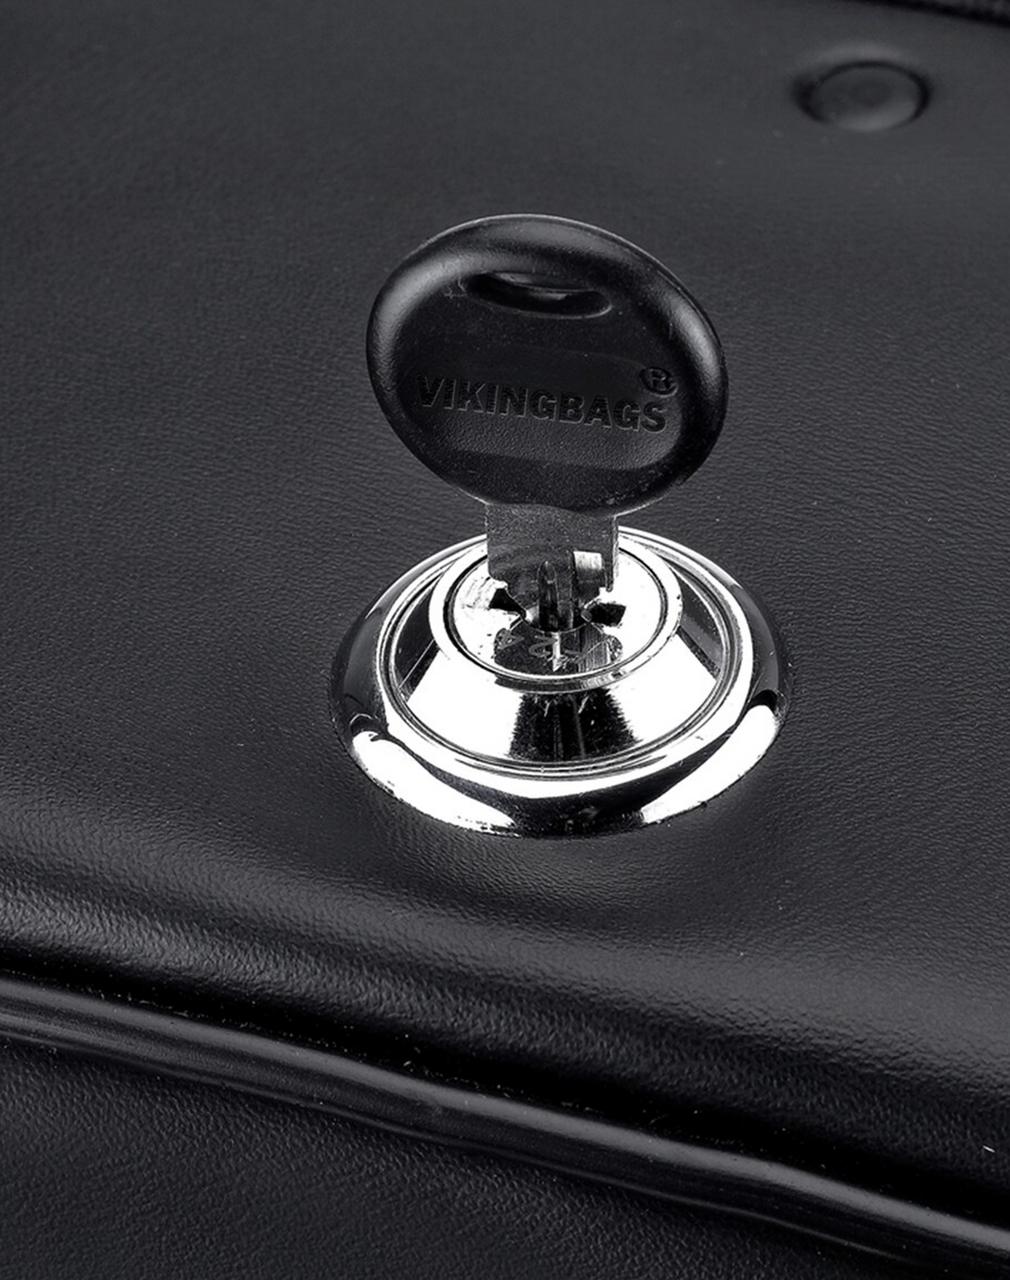 Honda 750 Shadow Aero Charger Single Strap Medium Motorcycle Saddlebags Key Lock View